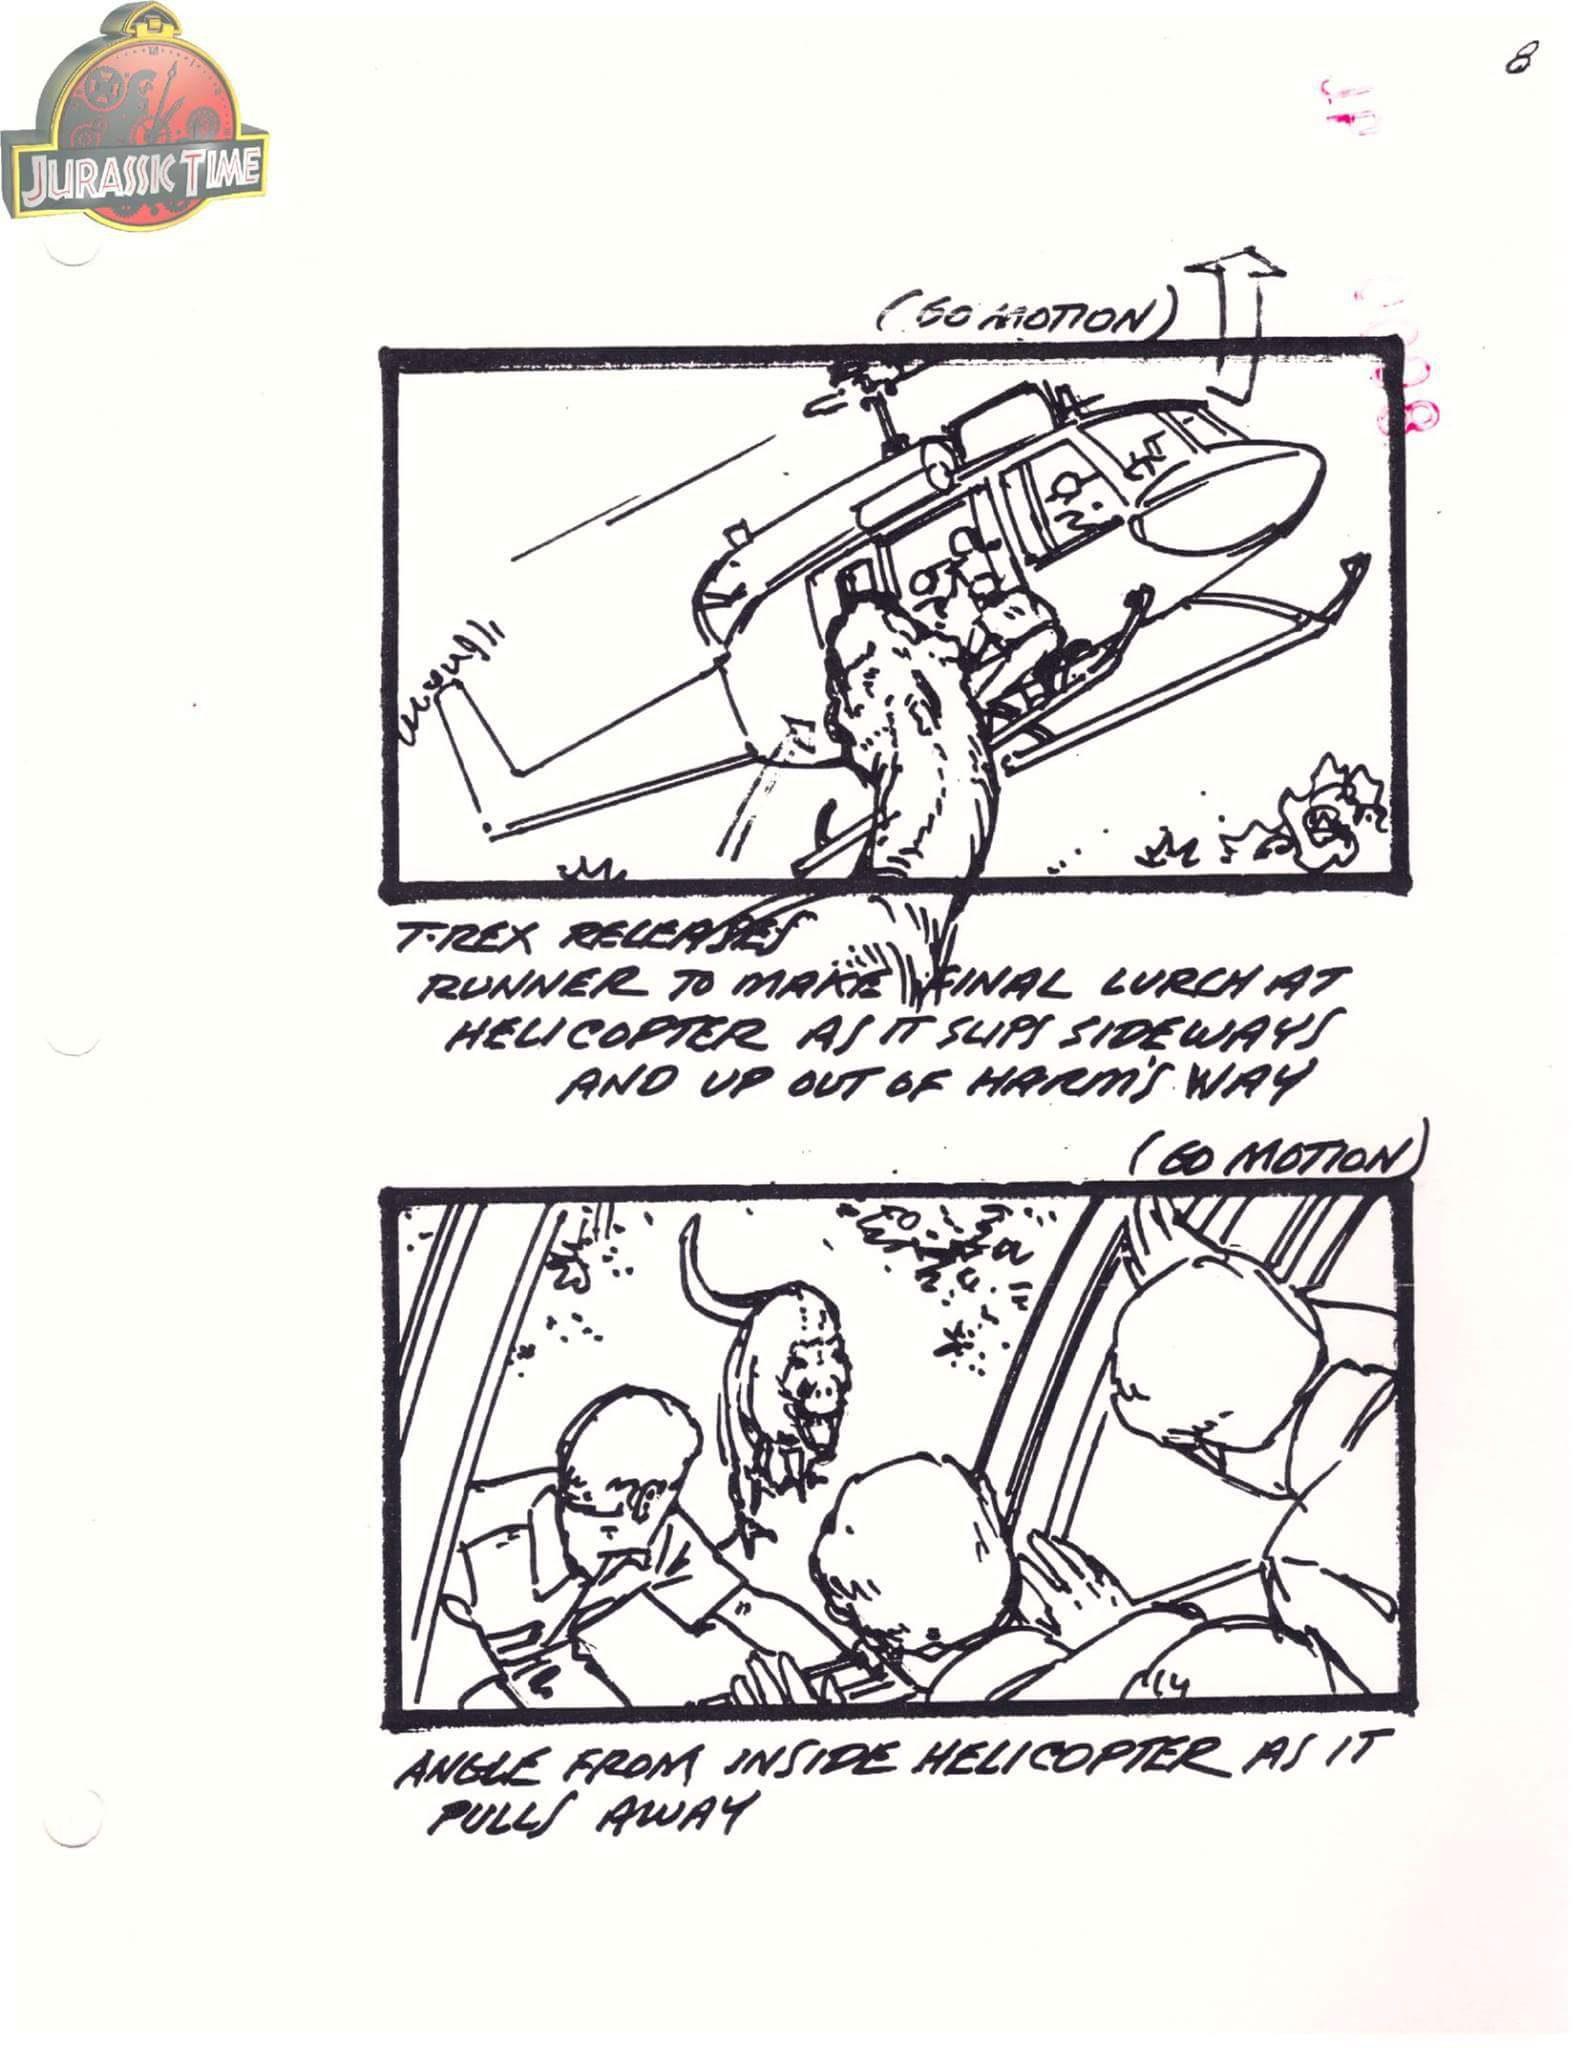 'Jurassic Park' (1993) Storyboard